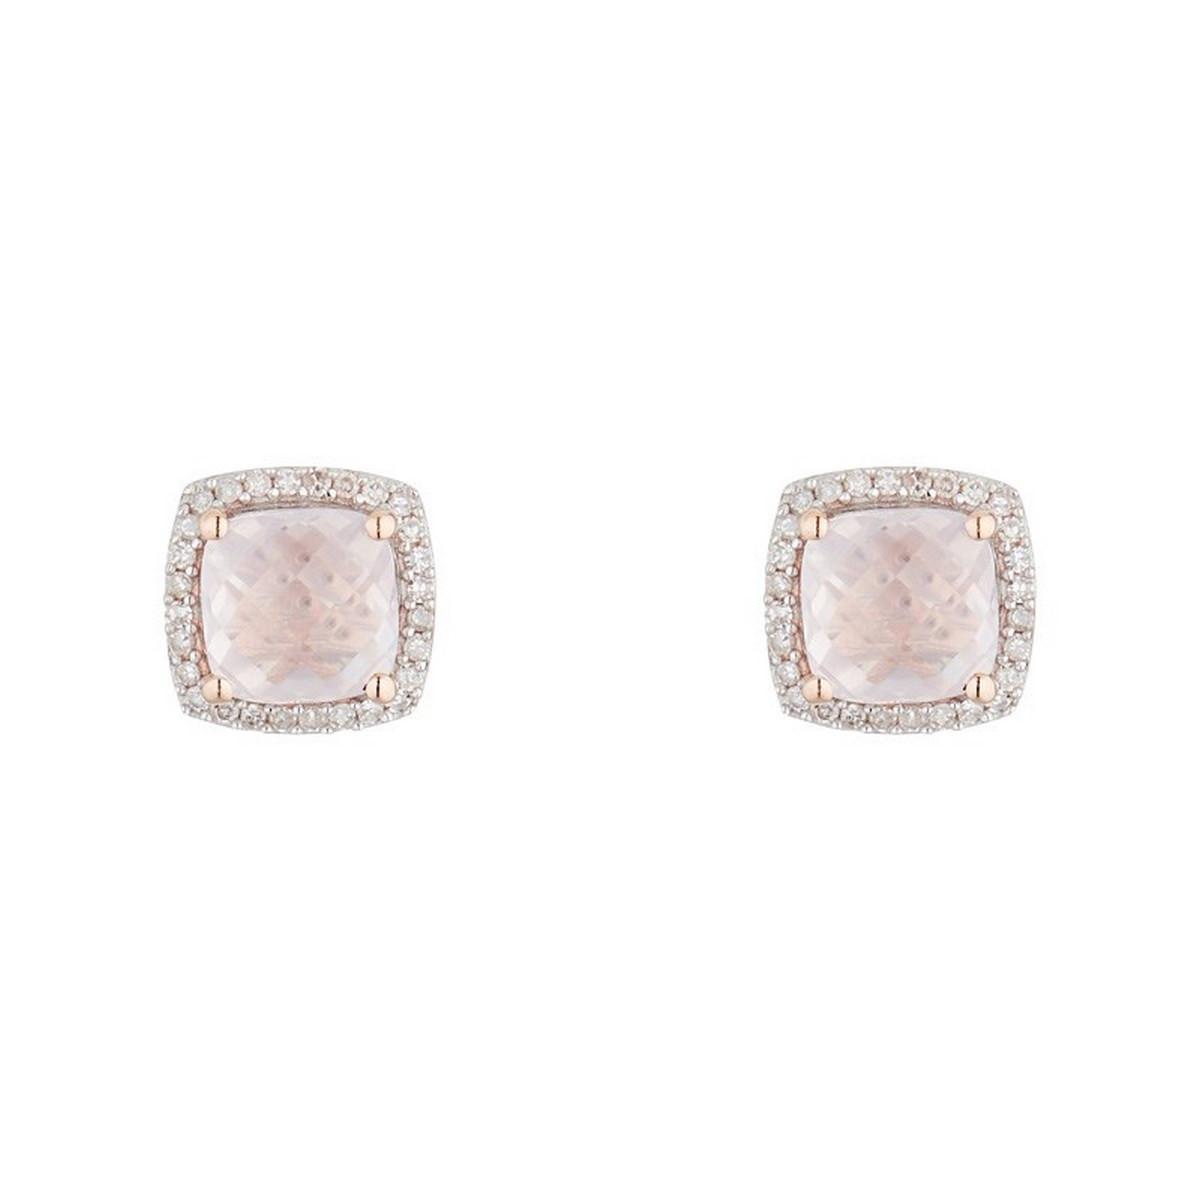 Boucles d'oreilles Or Rose ''QUARTISSIME'' D 0,18/56 & Rose Quartz 2,4/2